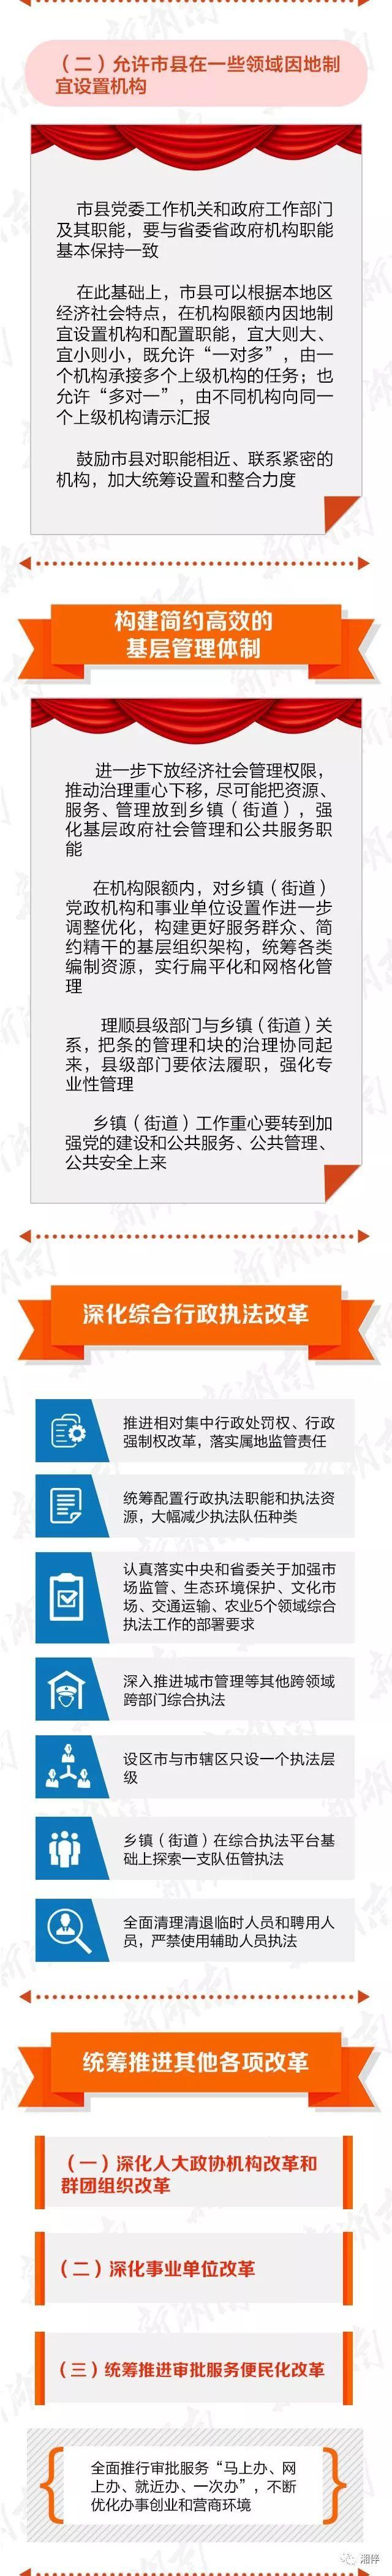 betball贝博软件下载|贝博安卓|贝博app苹果版市县机构改革图解3